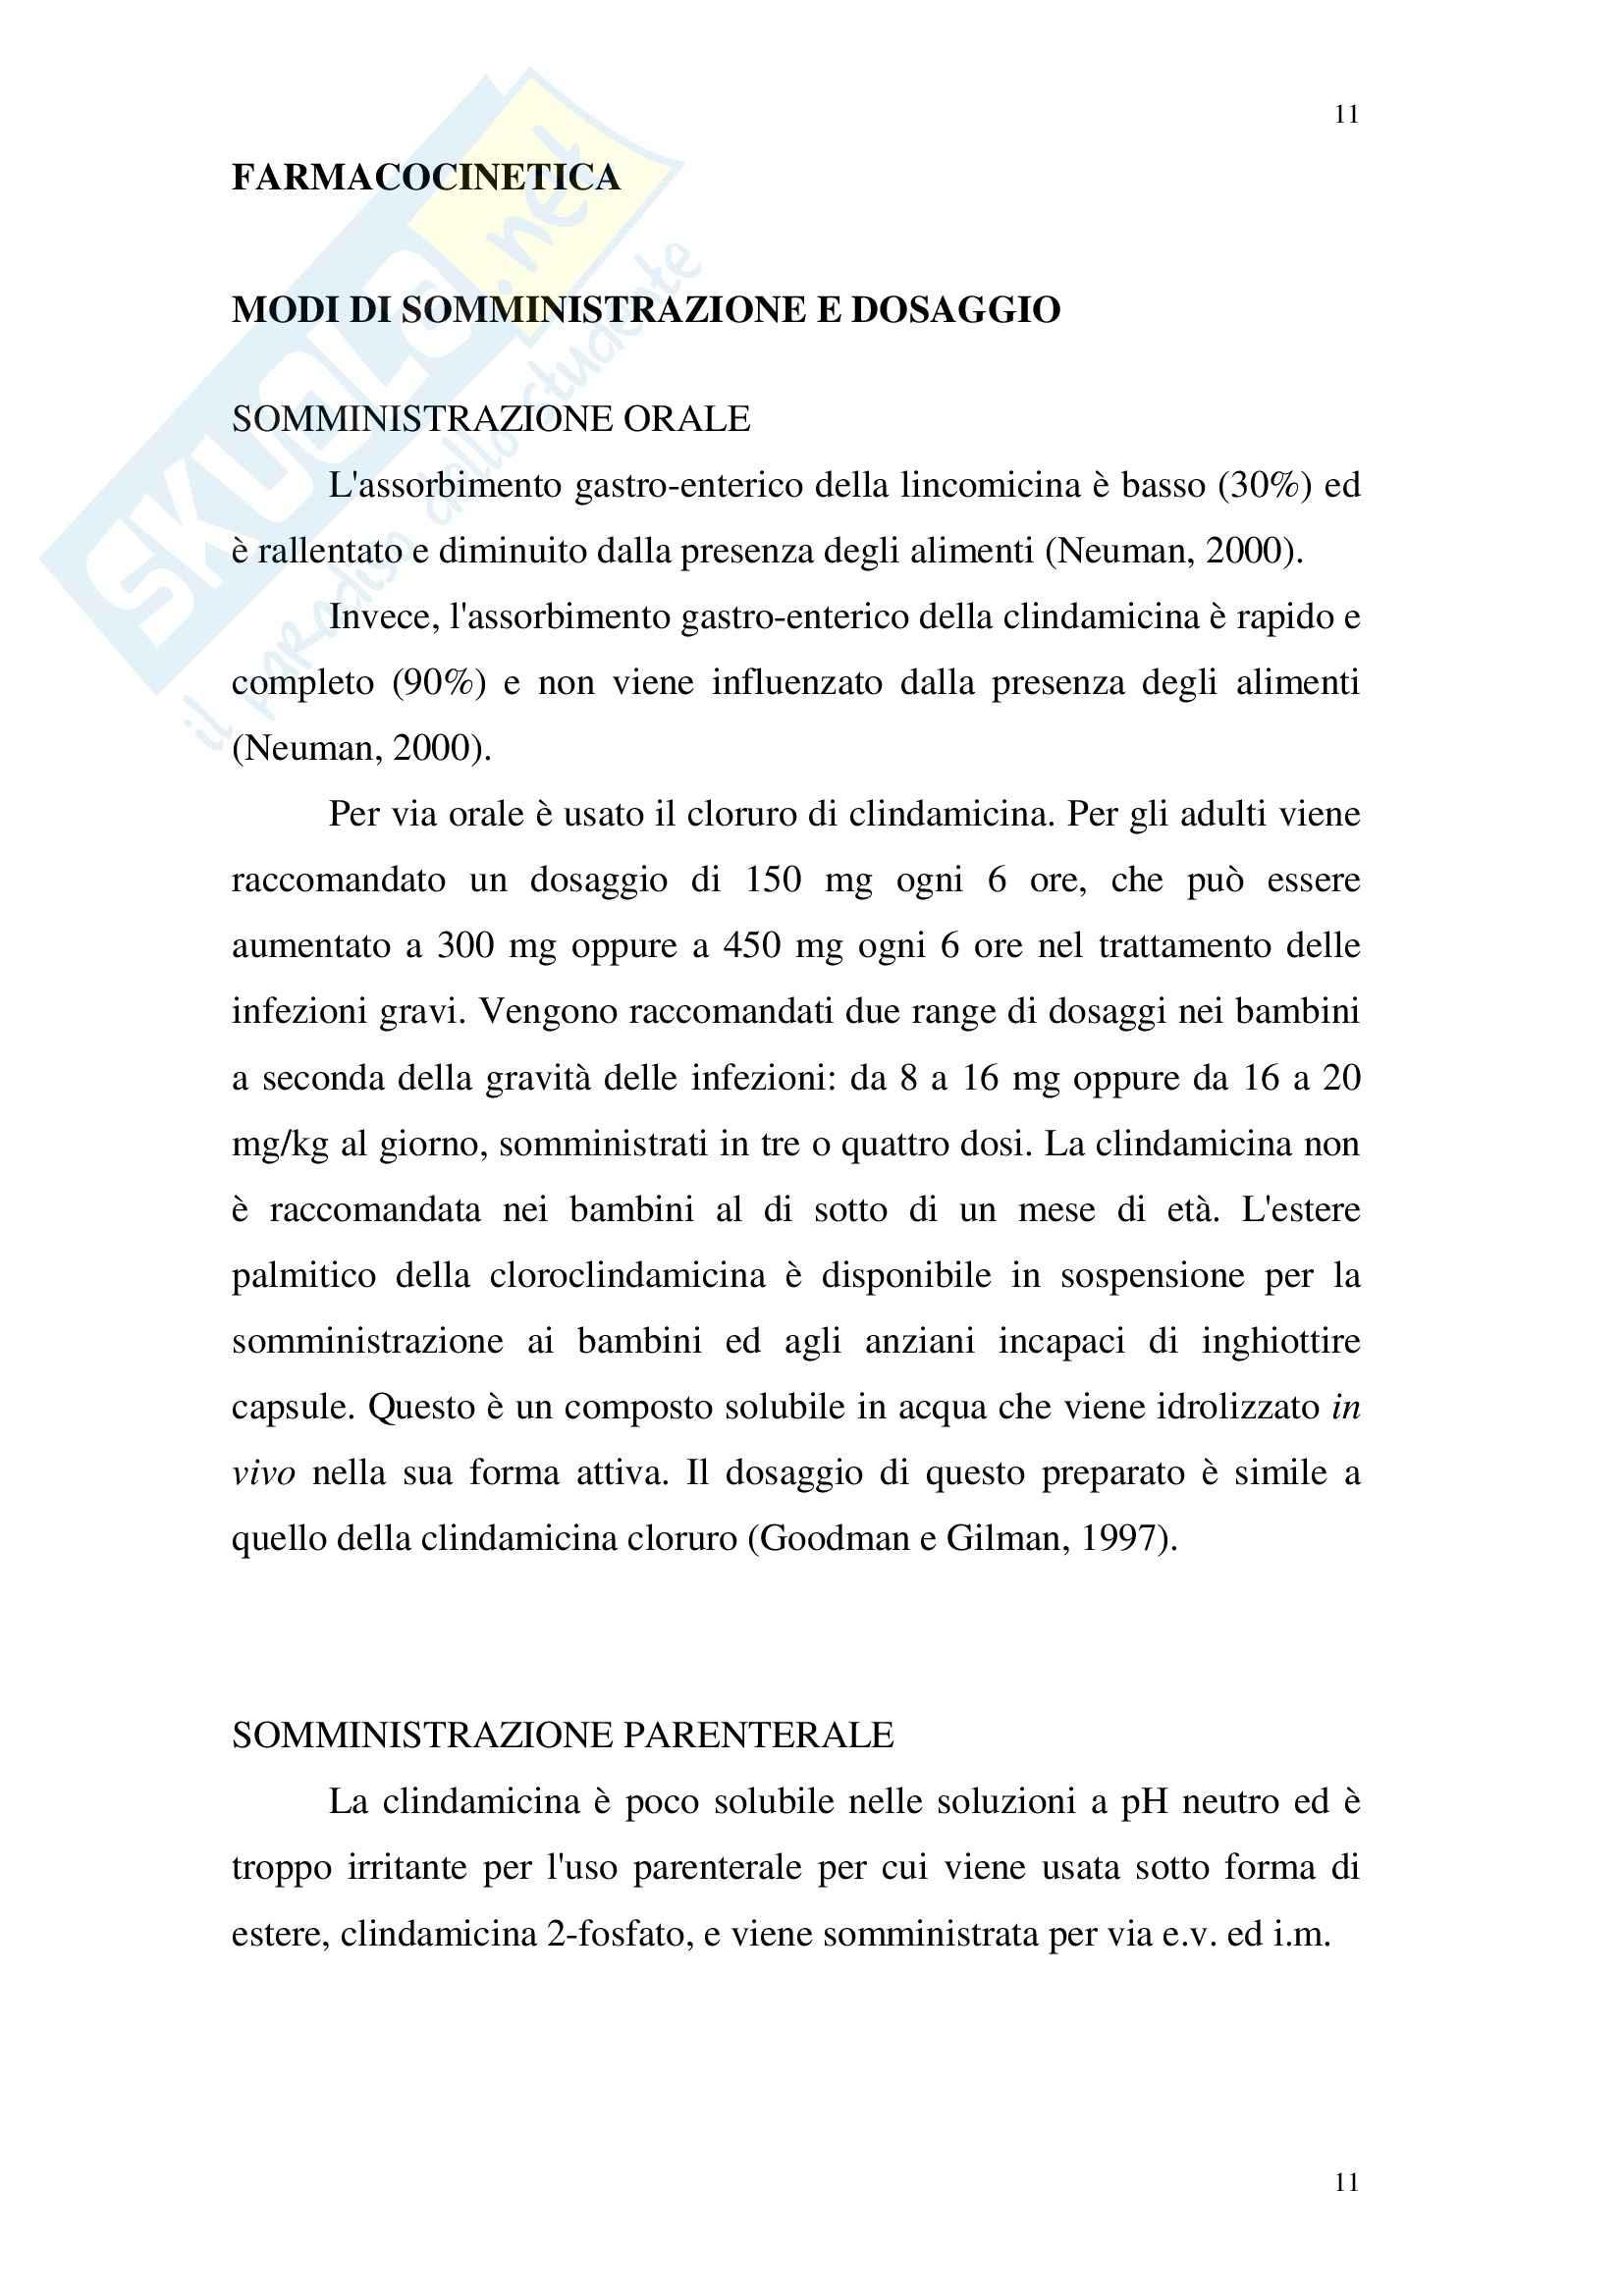 Chimica farmaceutica - lincosamidi Pag. 11